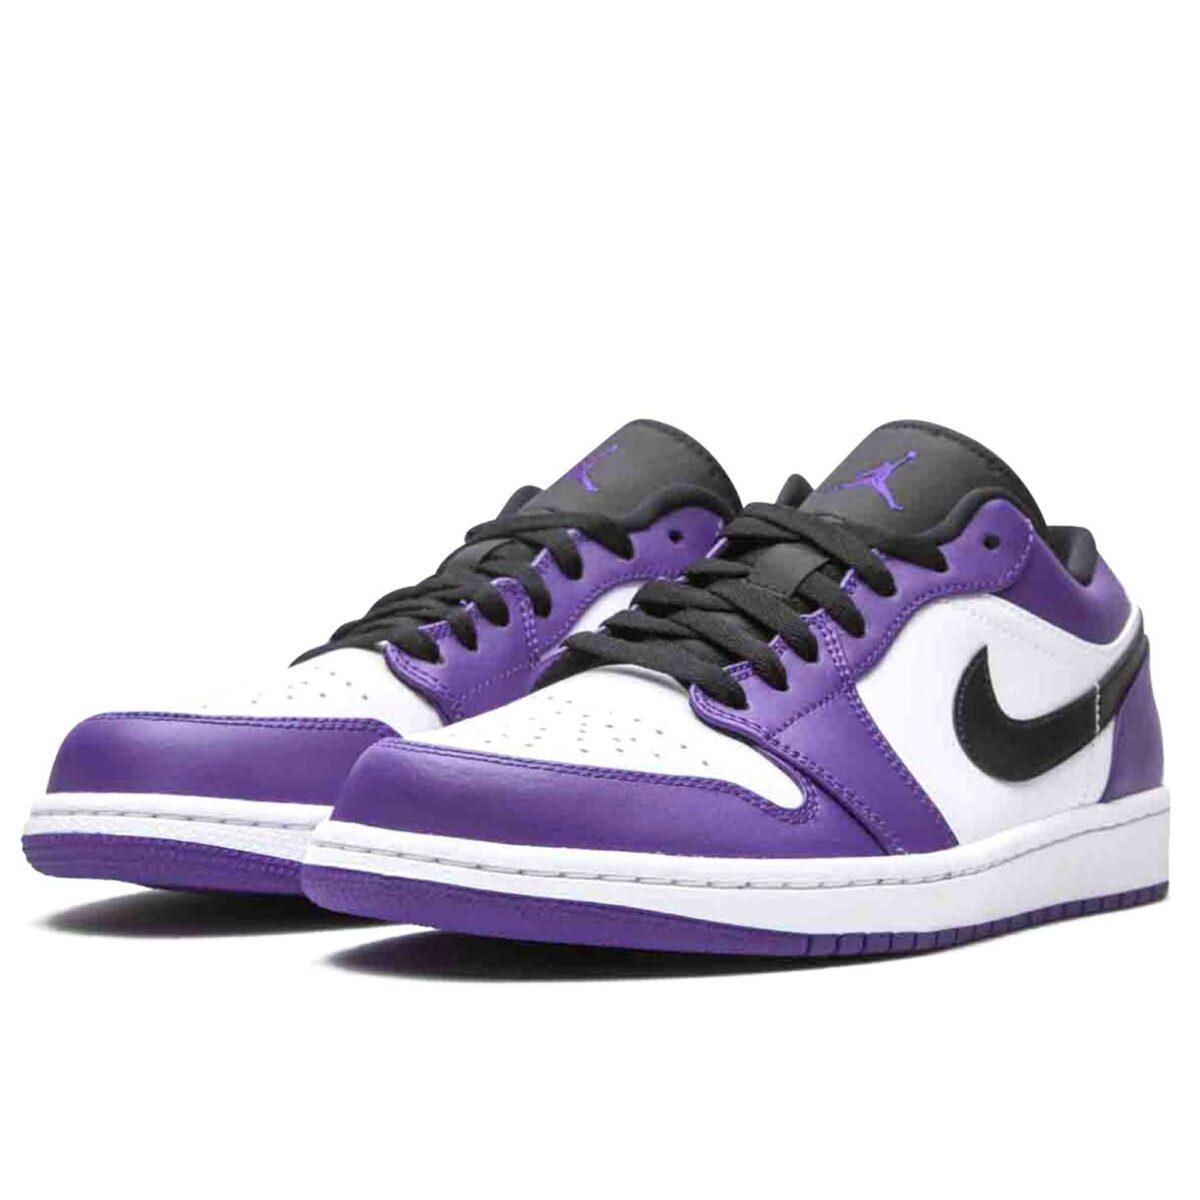 nike air jordan 1 low court purple 553558_500 купить